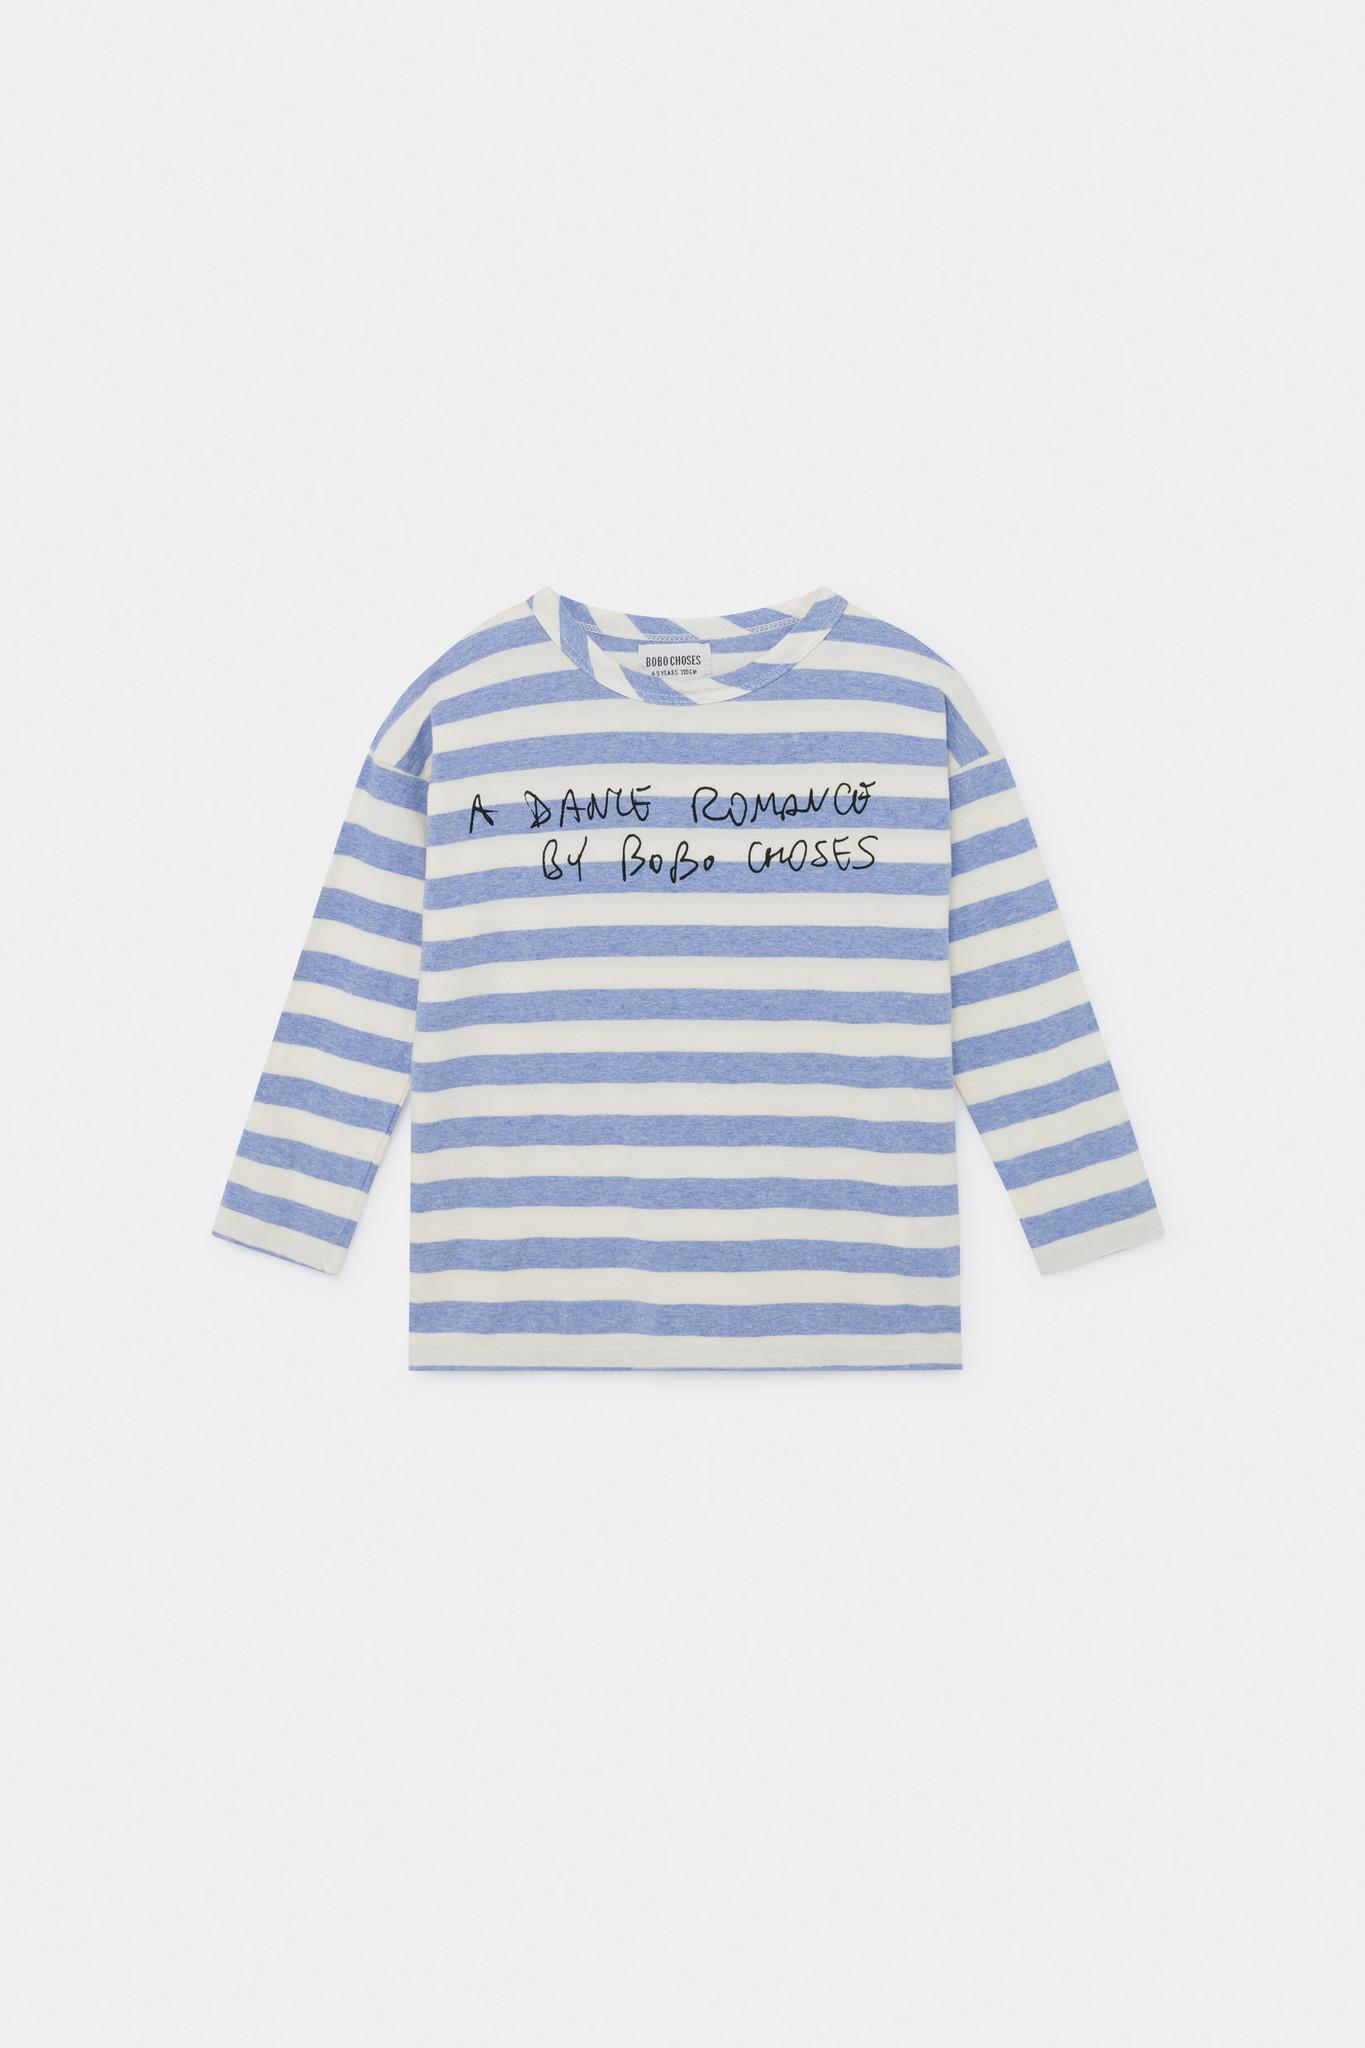 A Dance Romance Stripes Long Sleeve Shirt-1